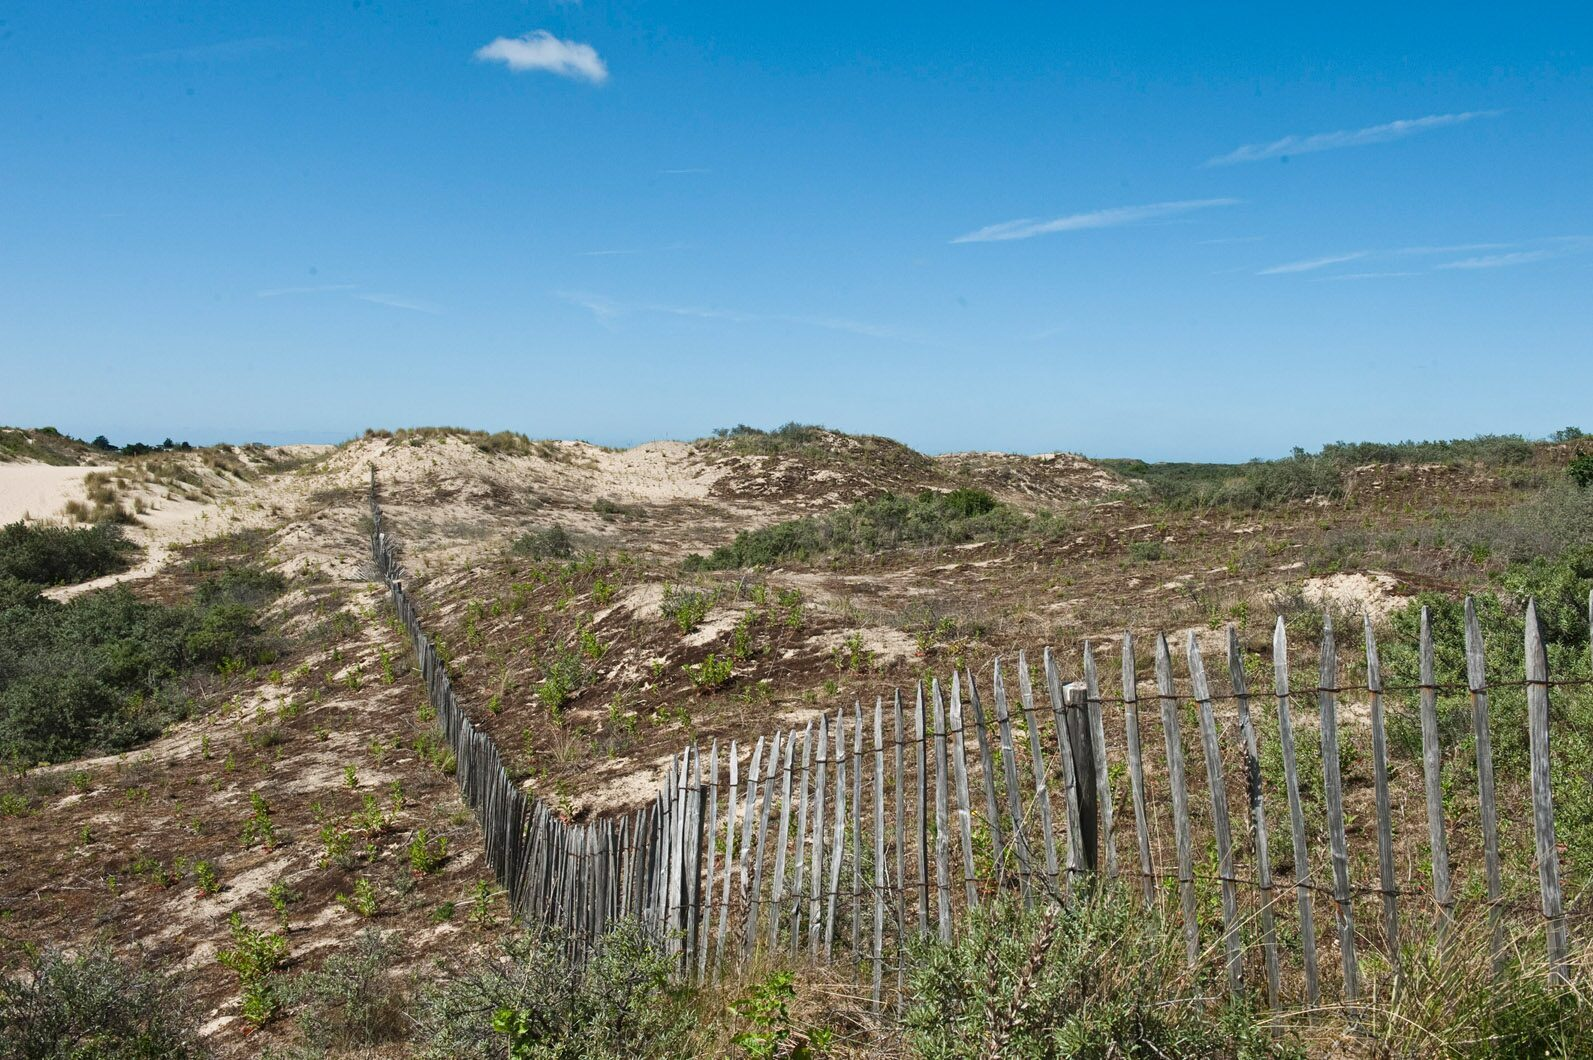 Bray-Dunes Etoile des Dunes (offline)